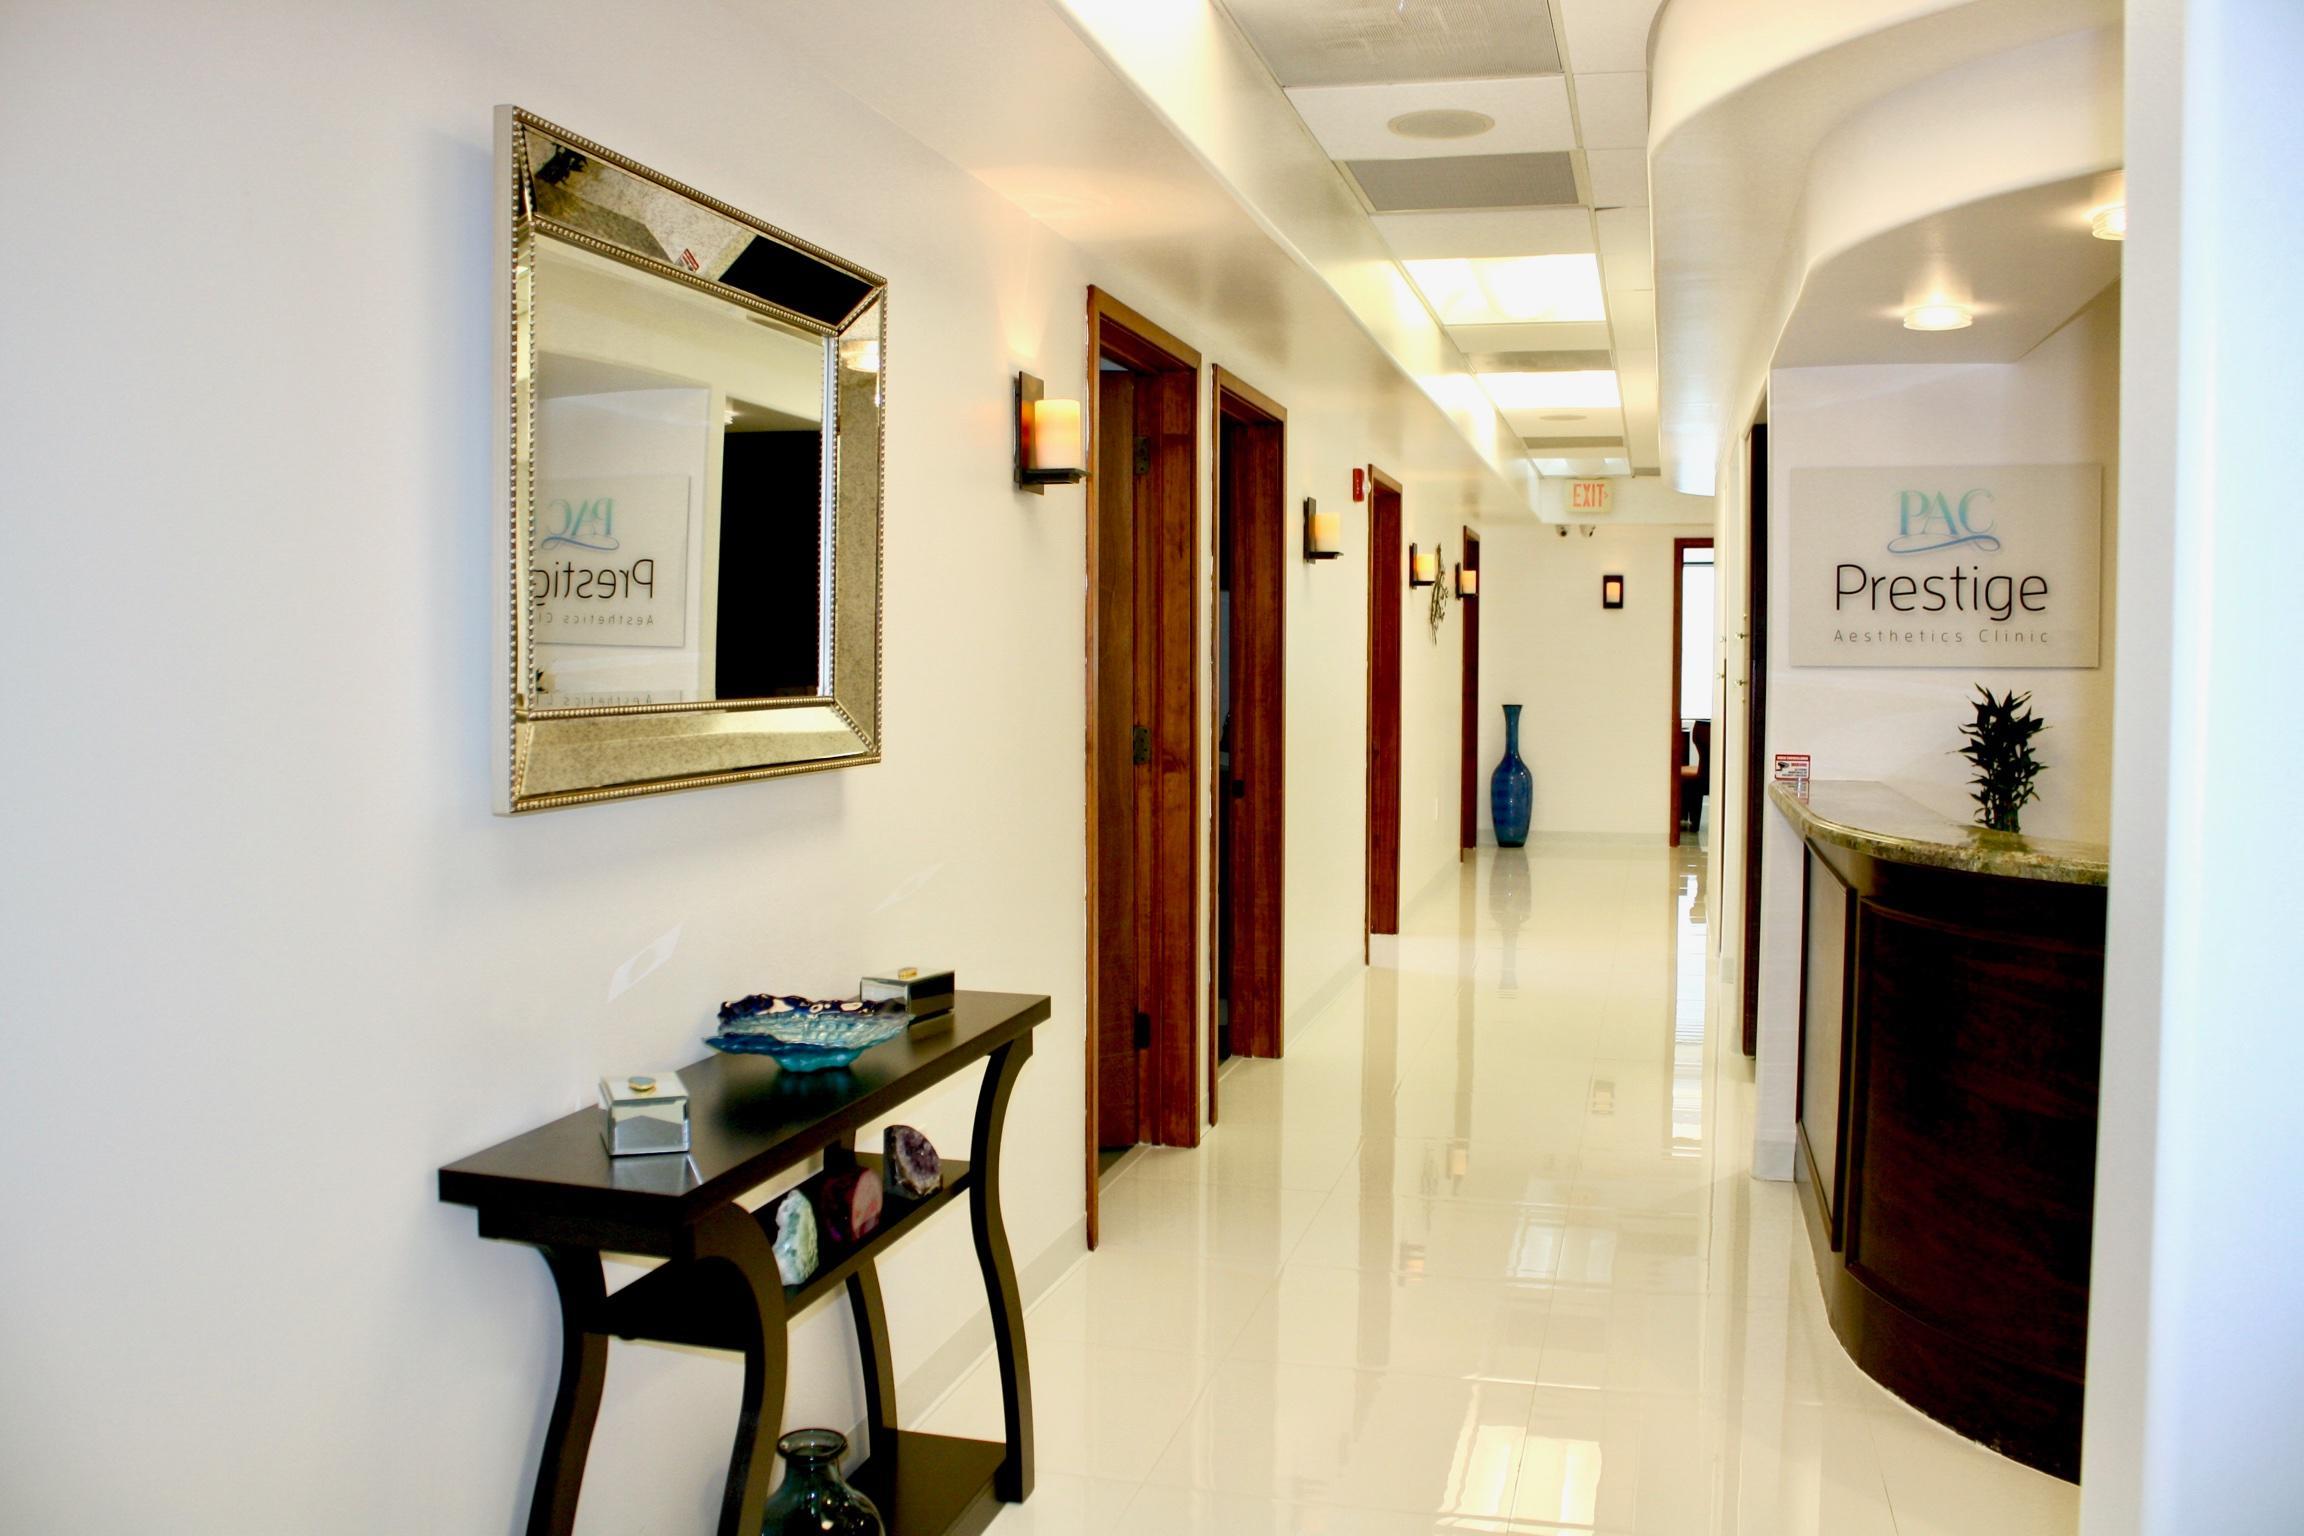 Prestige Aesthetics Clinic image 0